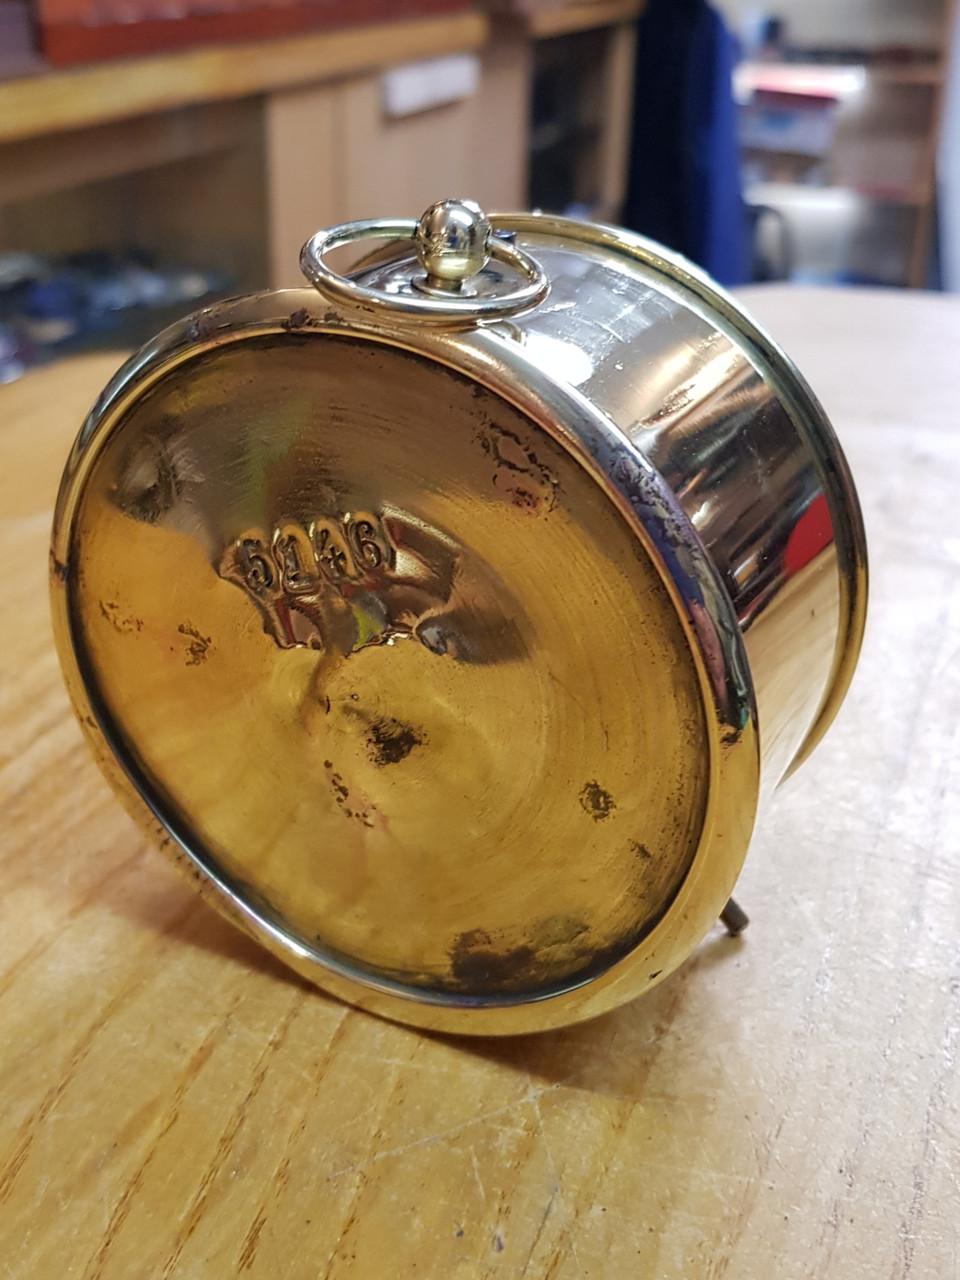 VT 3099. G.W.R. BRASS SIGNAL BOX DRUM CLOCK SUPPLIED BY KAYS.